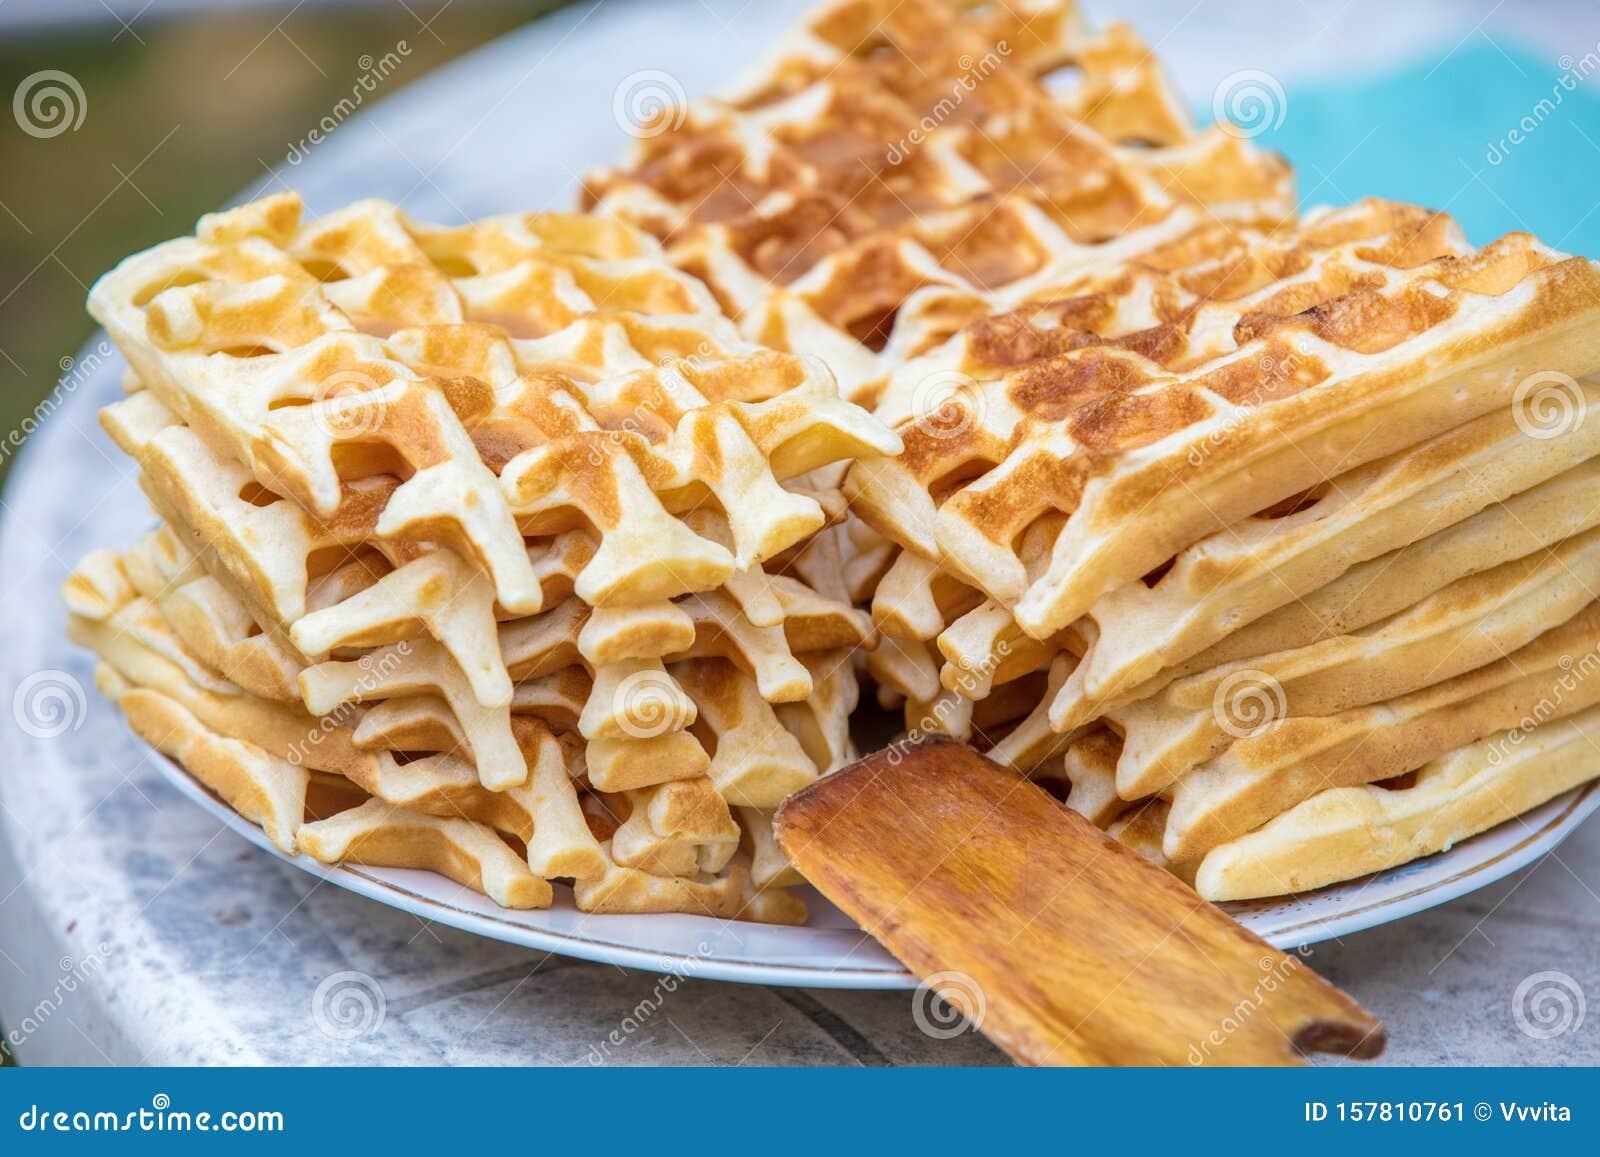 A pile of homemade Belgian Waffles